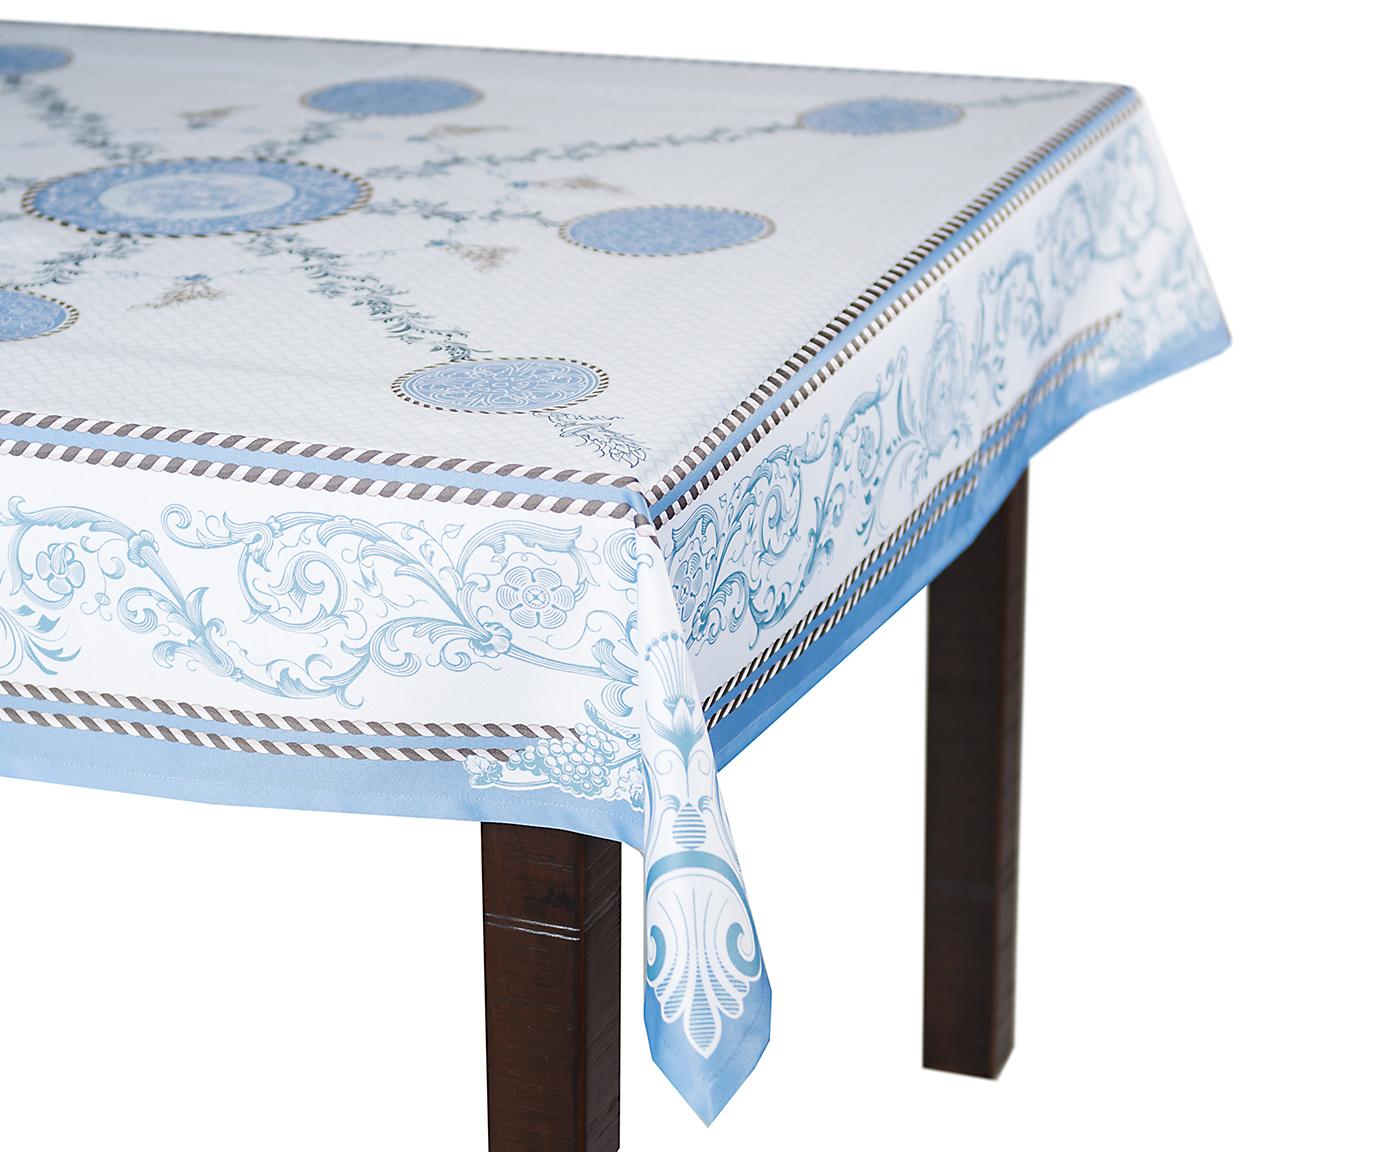 Кухня Скатерть 140x180 Blonder Home Laroux синяя skatert-140x180-blonder-home-laroux-sinyaya-ssha-rossiya.jpg